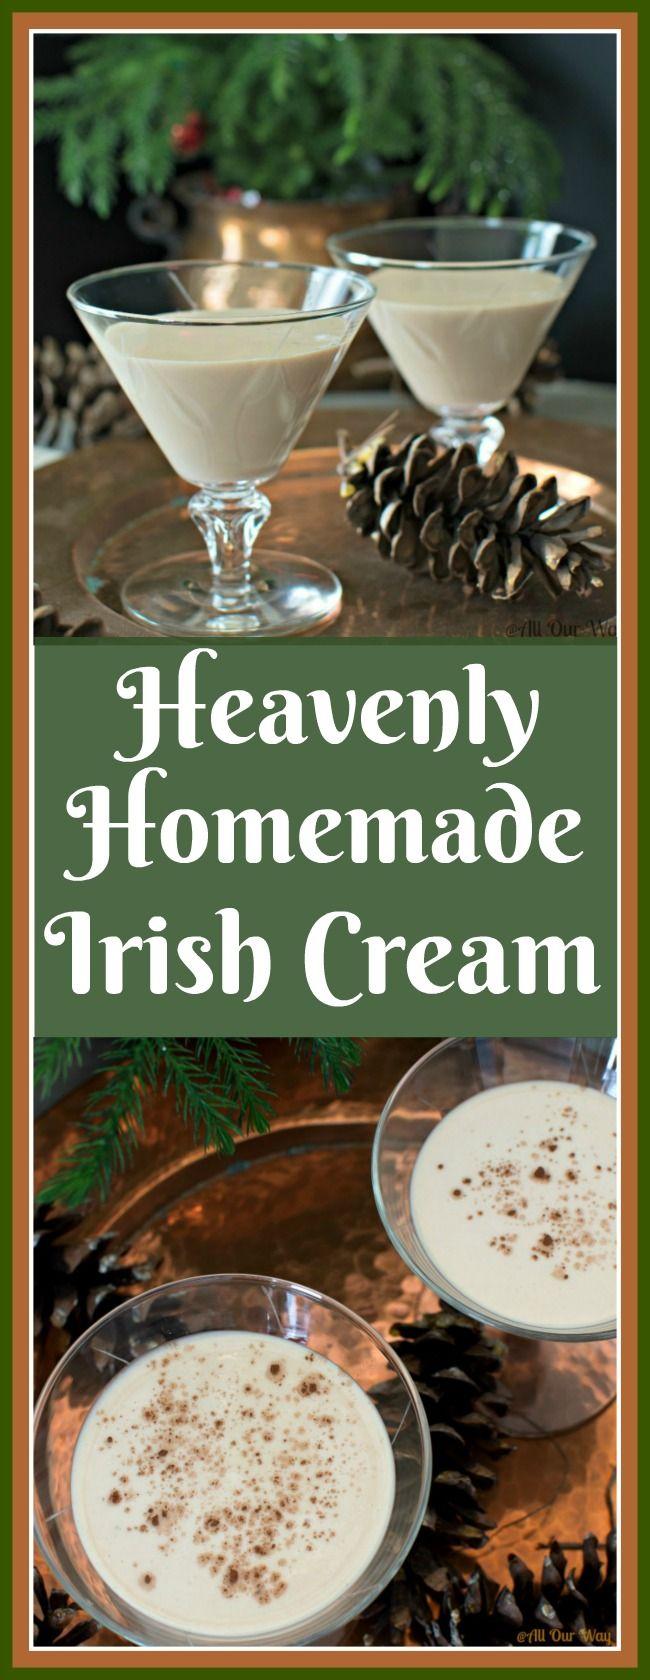 Heavenly Homemade Irish Cream Rich & Smooth #creamdesserts